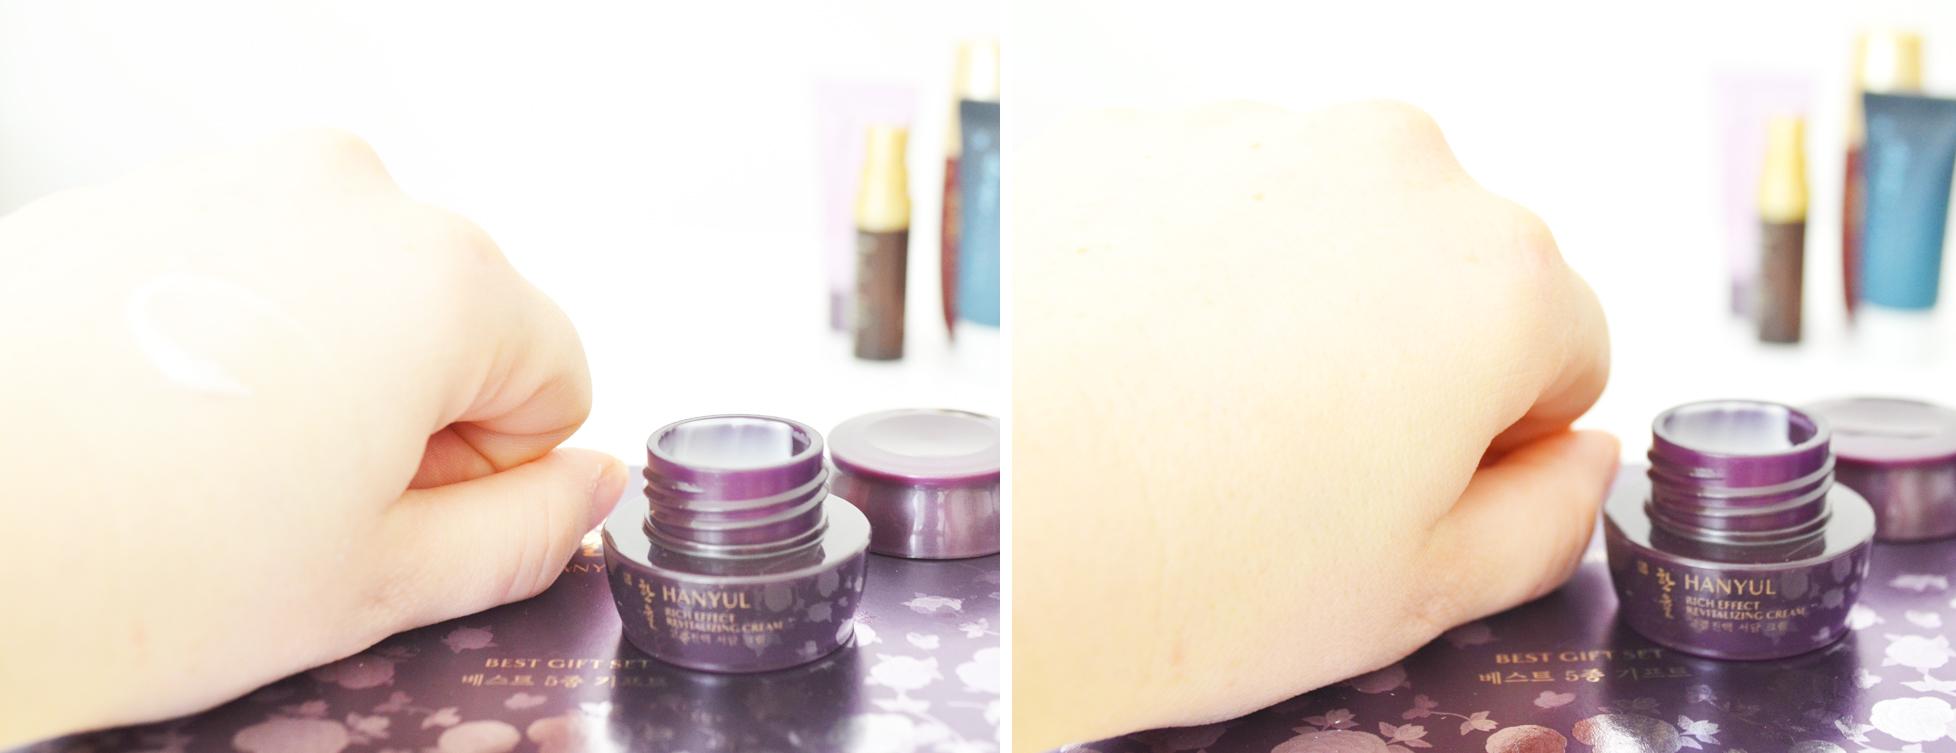 hanyul-rich-effect-revitalizing-cream-avis-revue